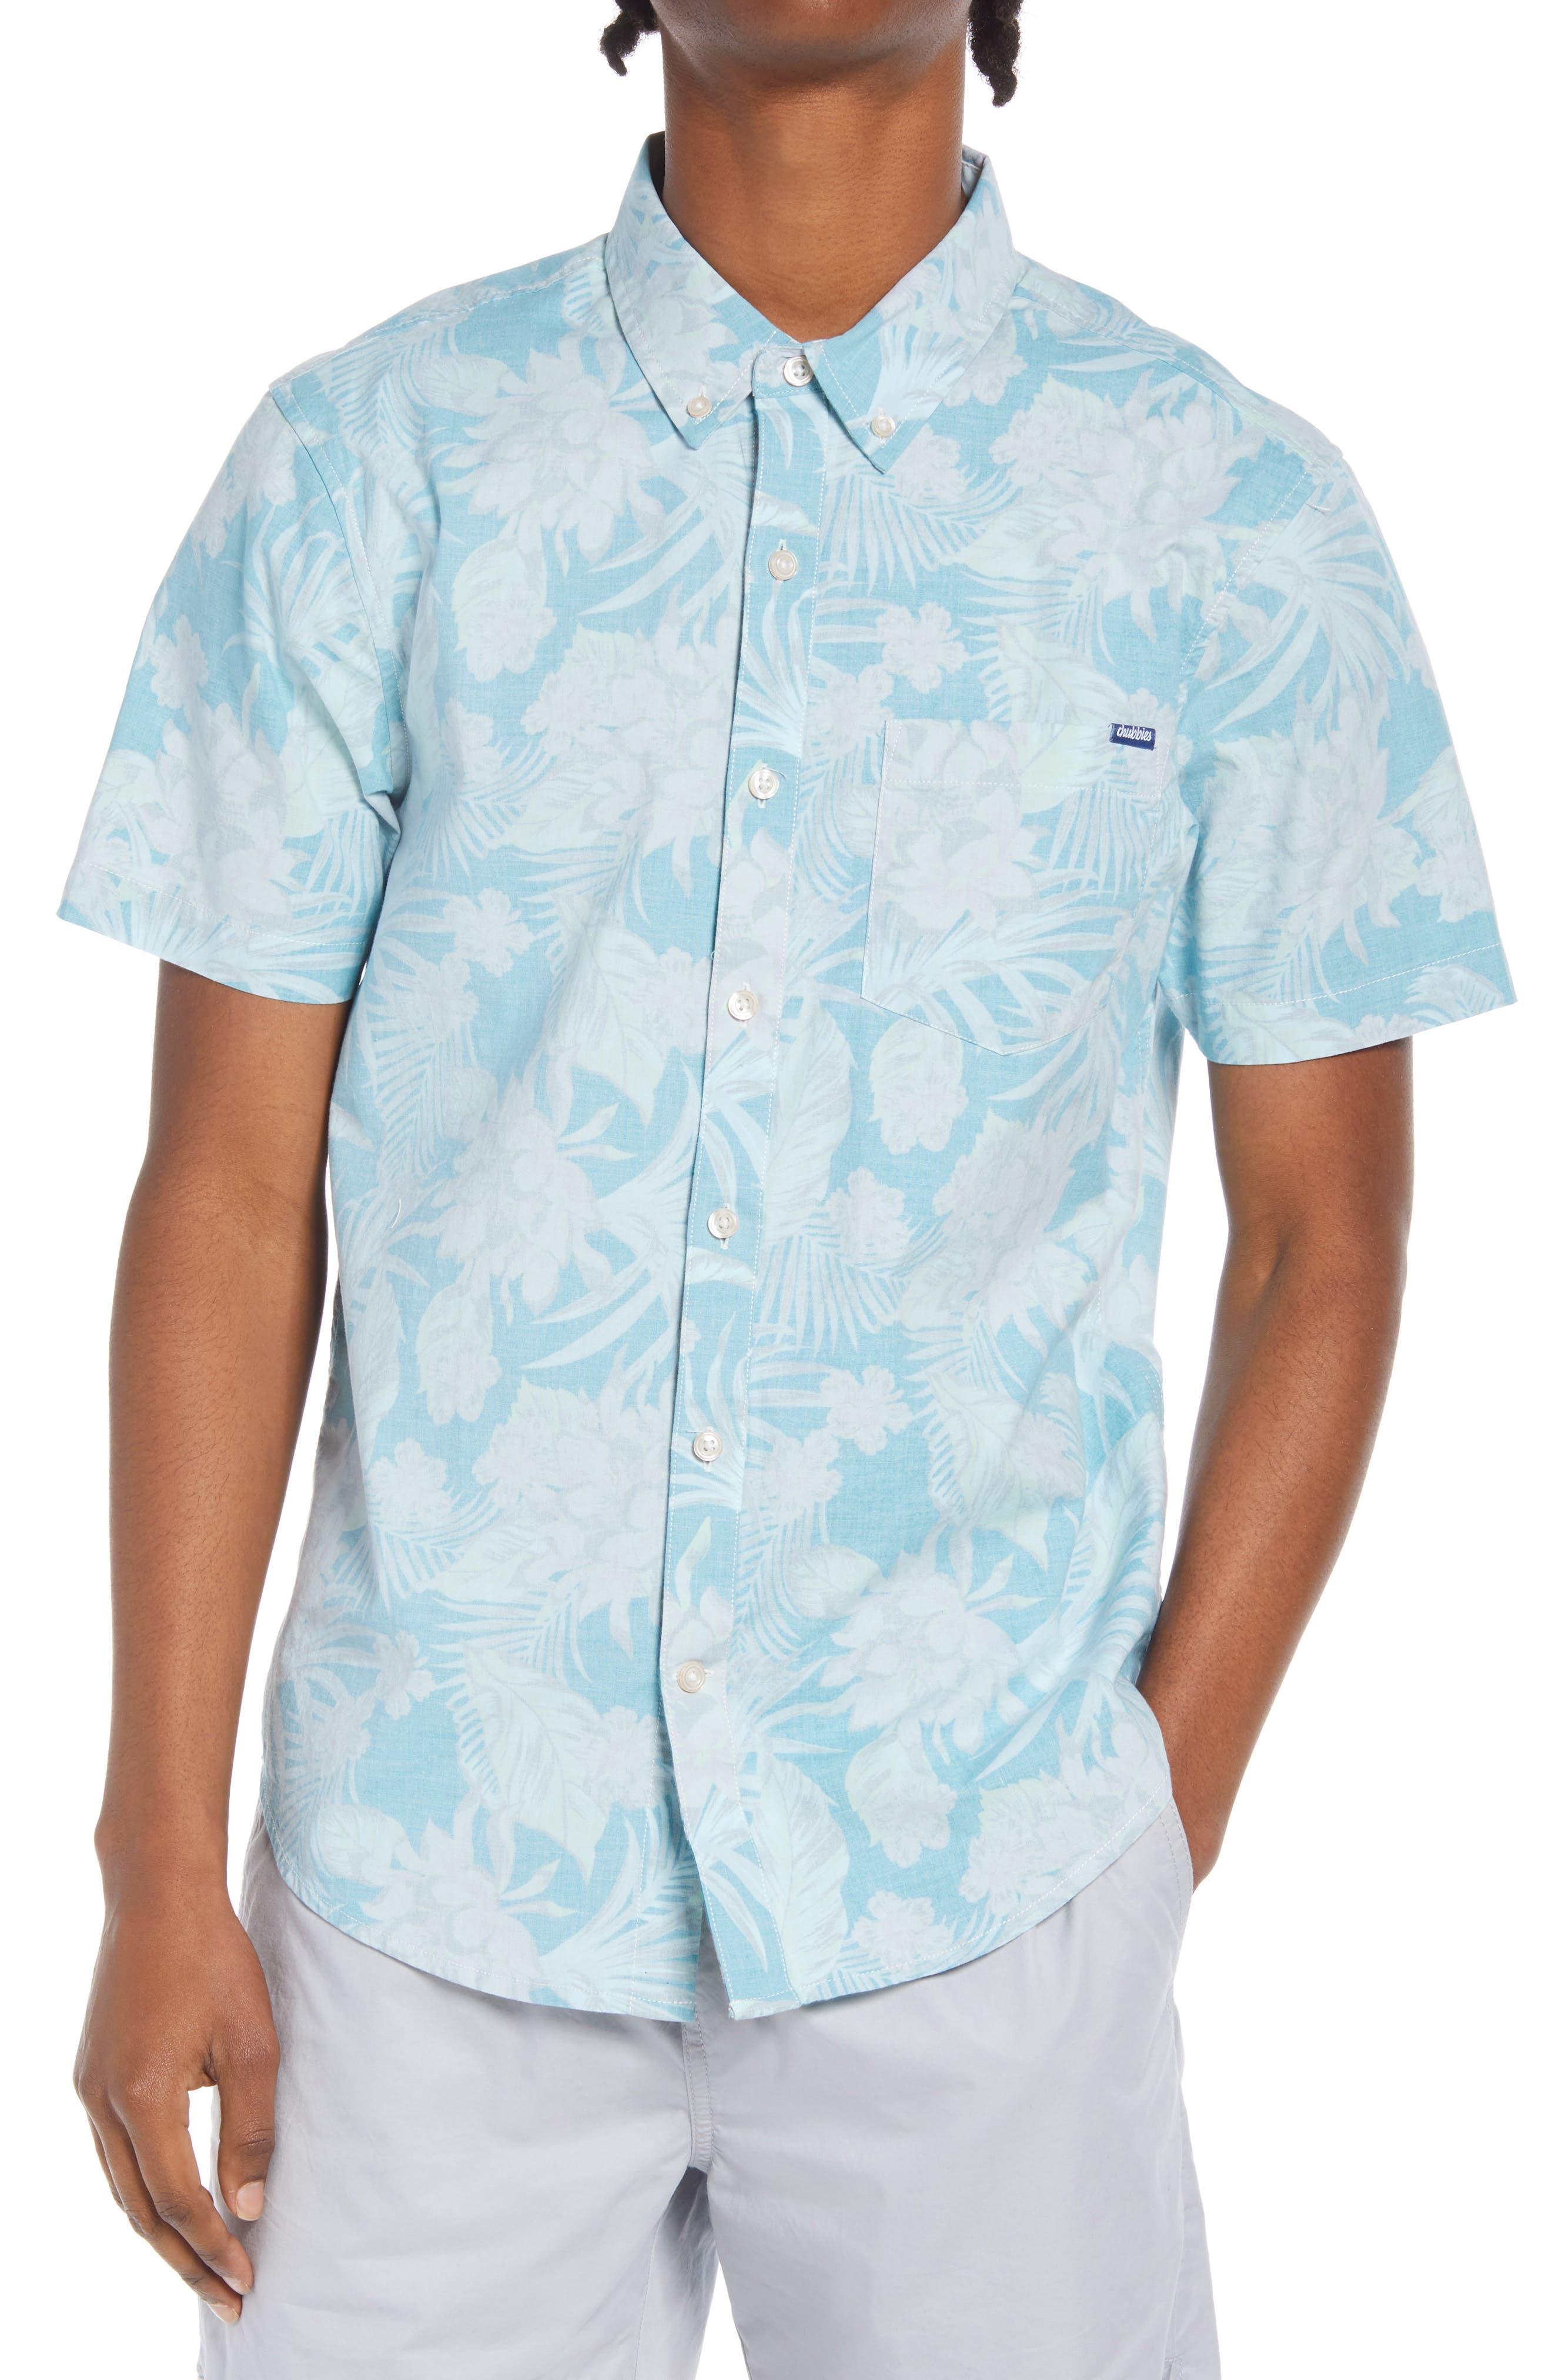 The Wanderer Floral Short Sleeve Button-Down Shirt